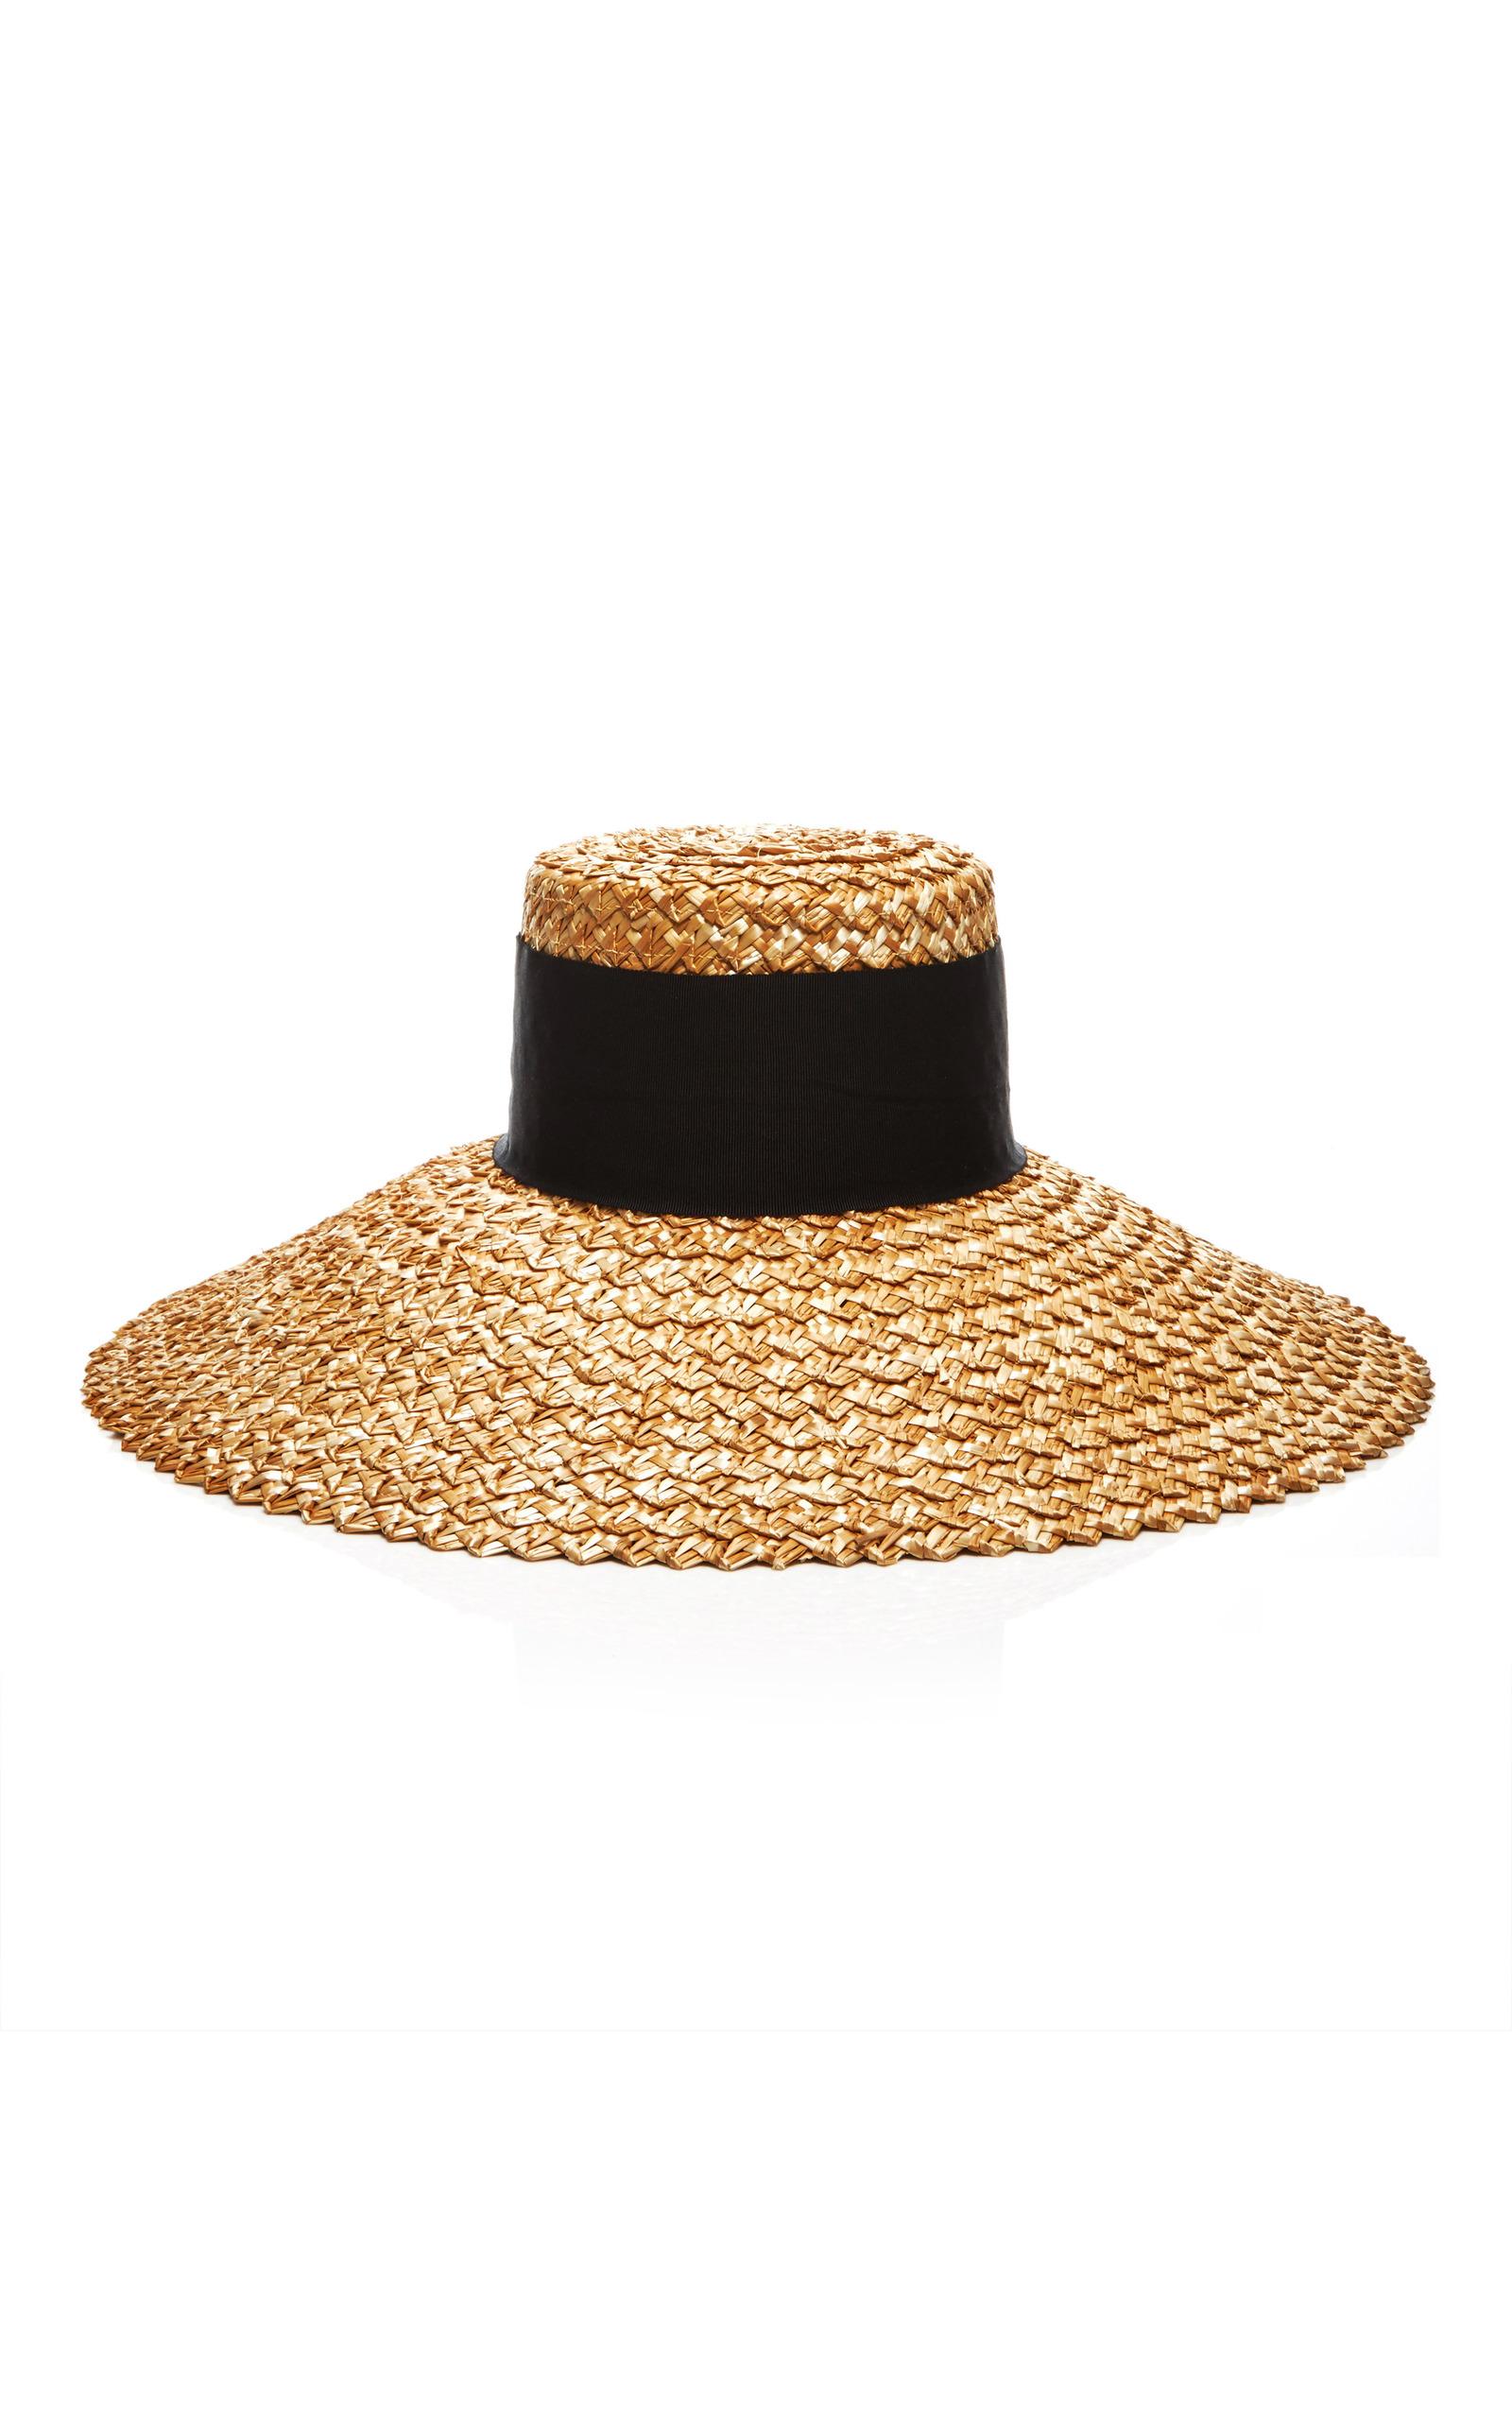 52cd923b045fb Eugenia KimMirabel Sun Hat. CLOSE. Loading